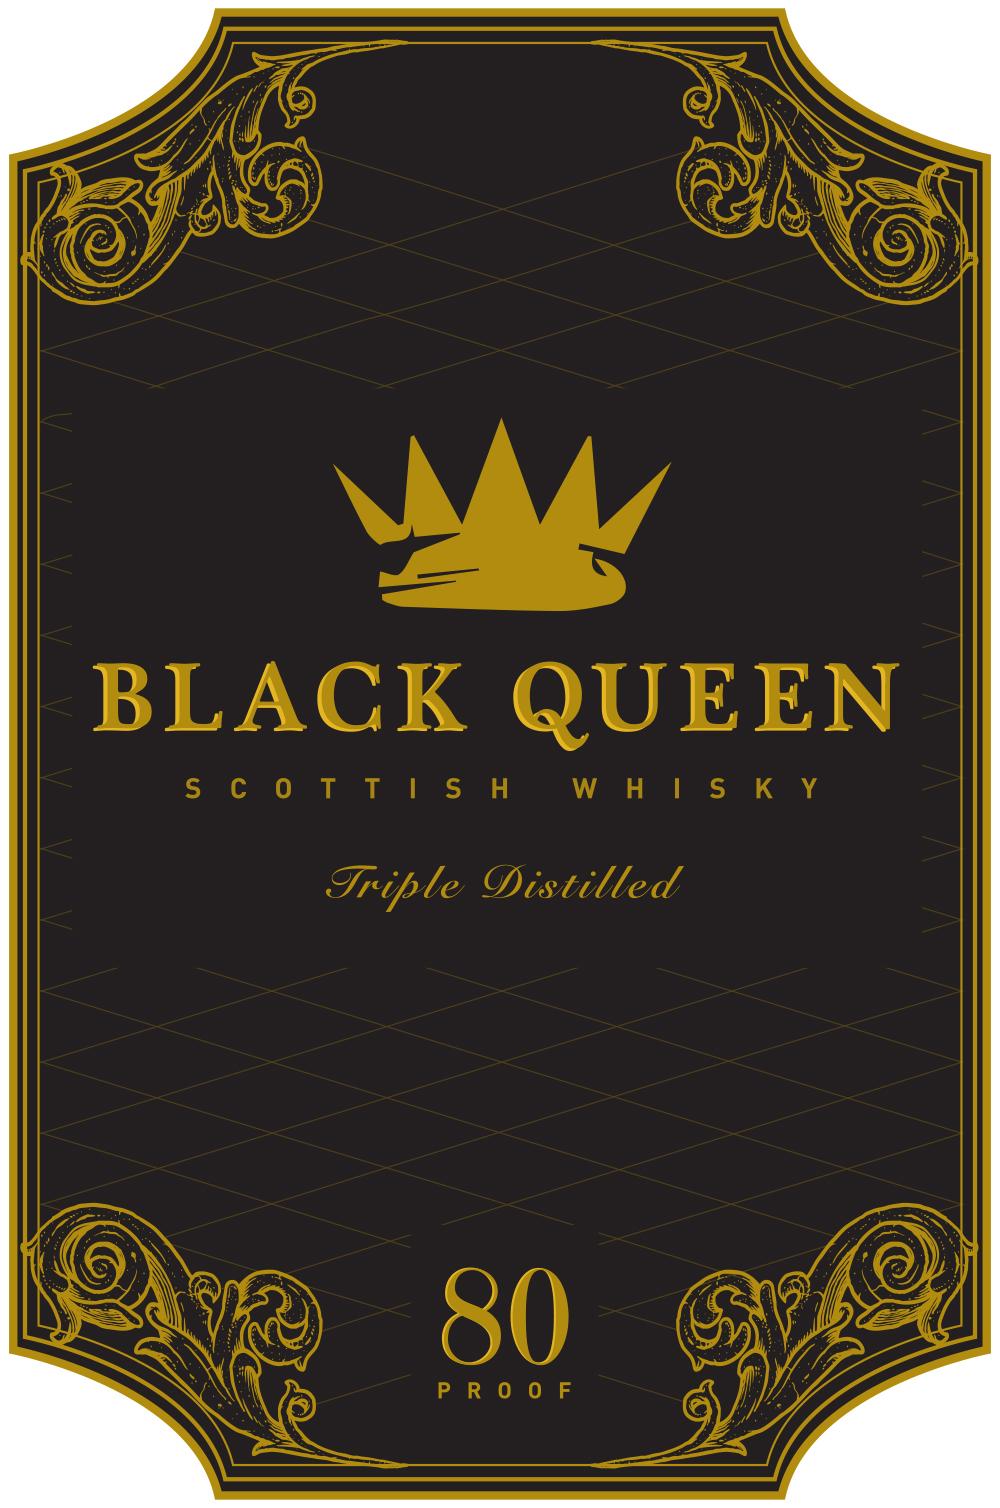 Black_Queen_FINAL-1.jpg